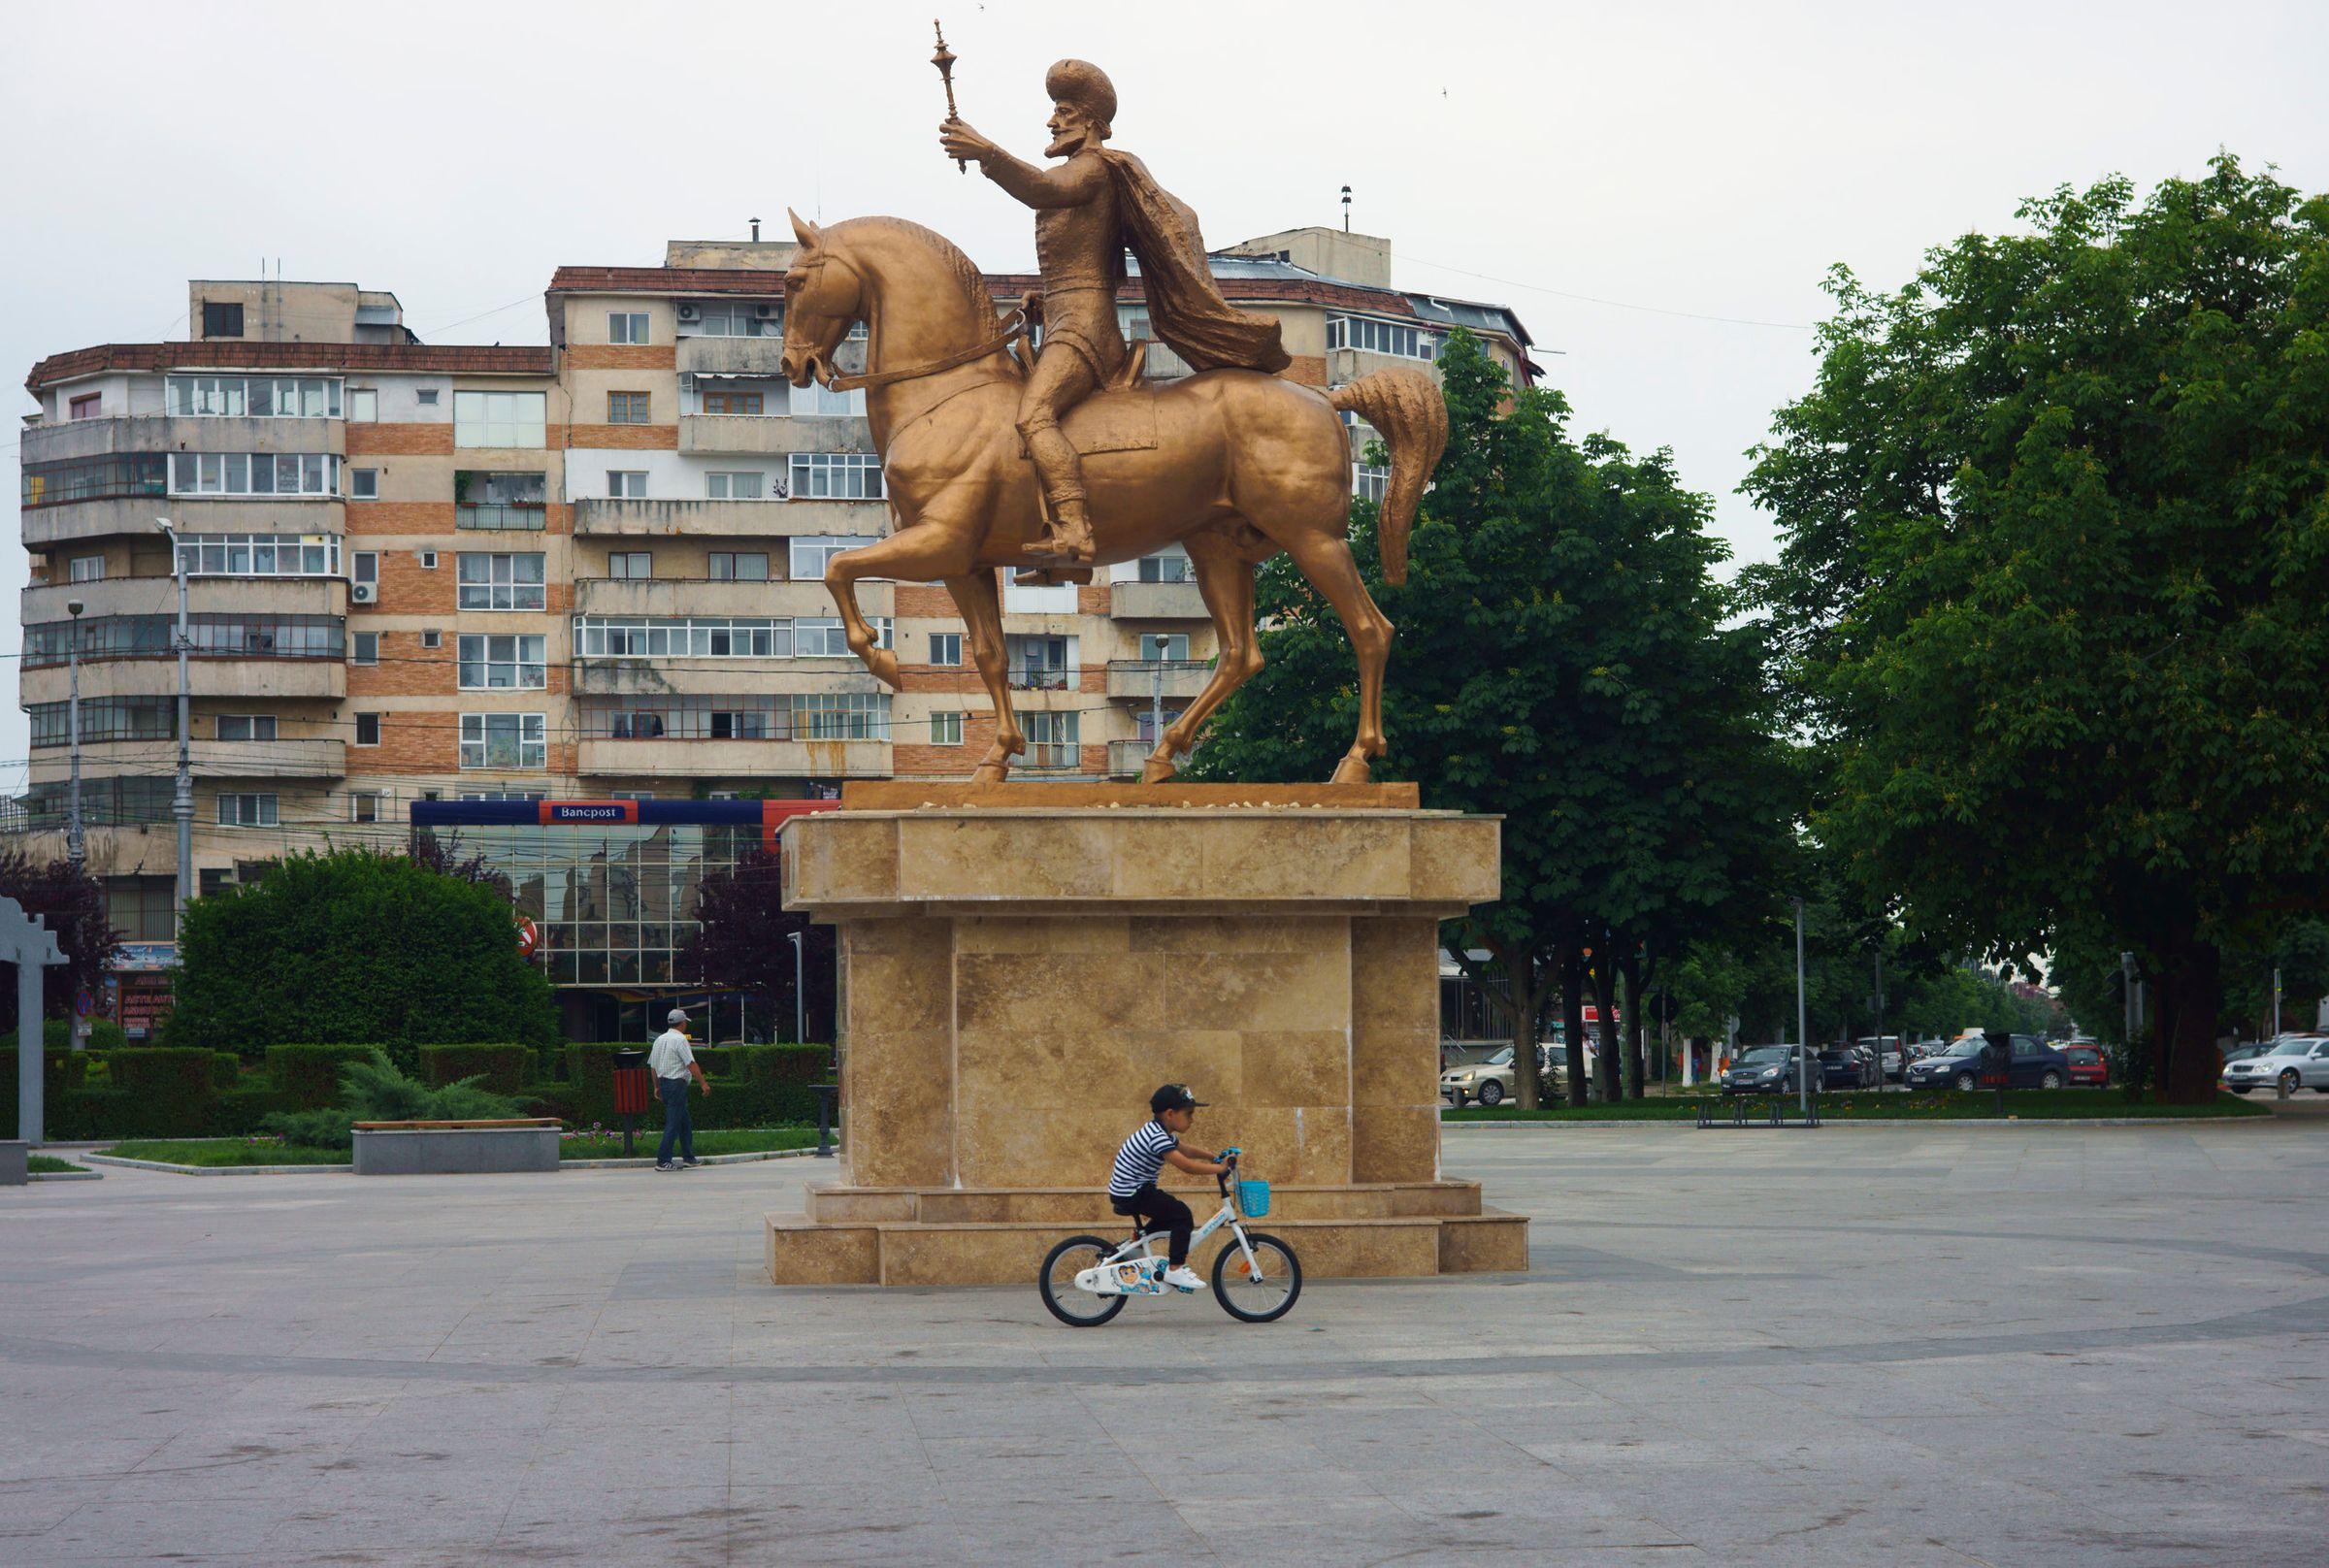 Onward, Tirgoviste